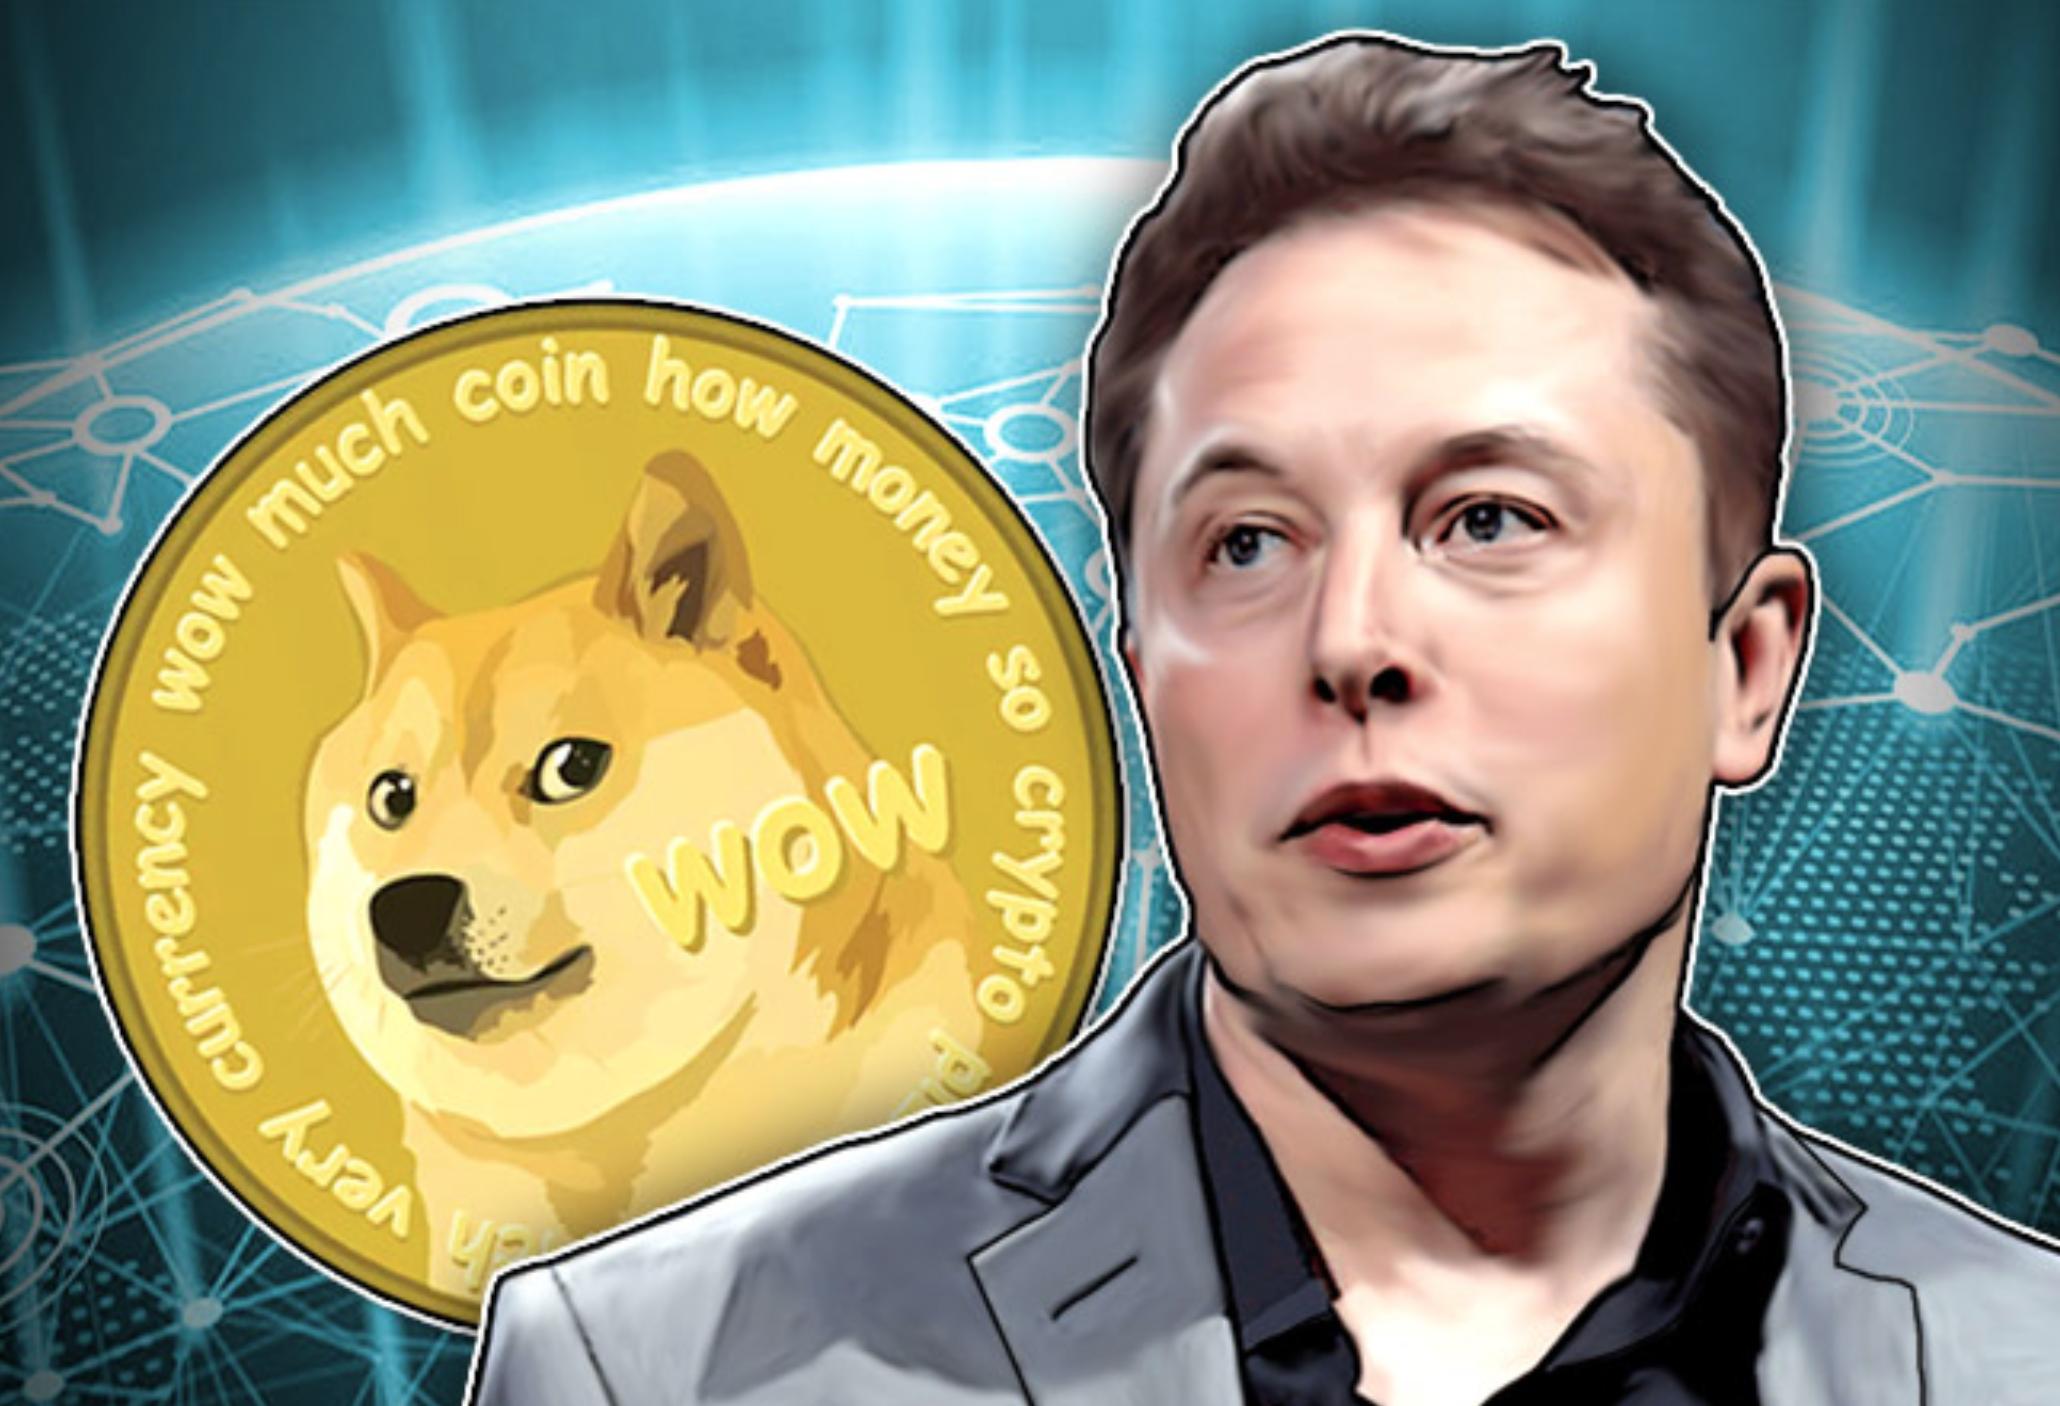 Dogecoin is pump and dump schema